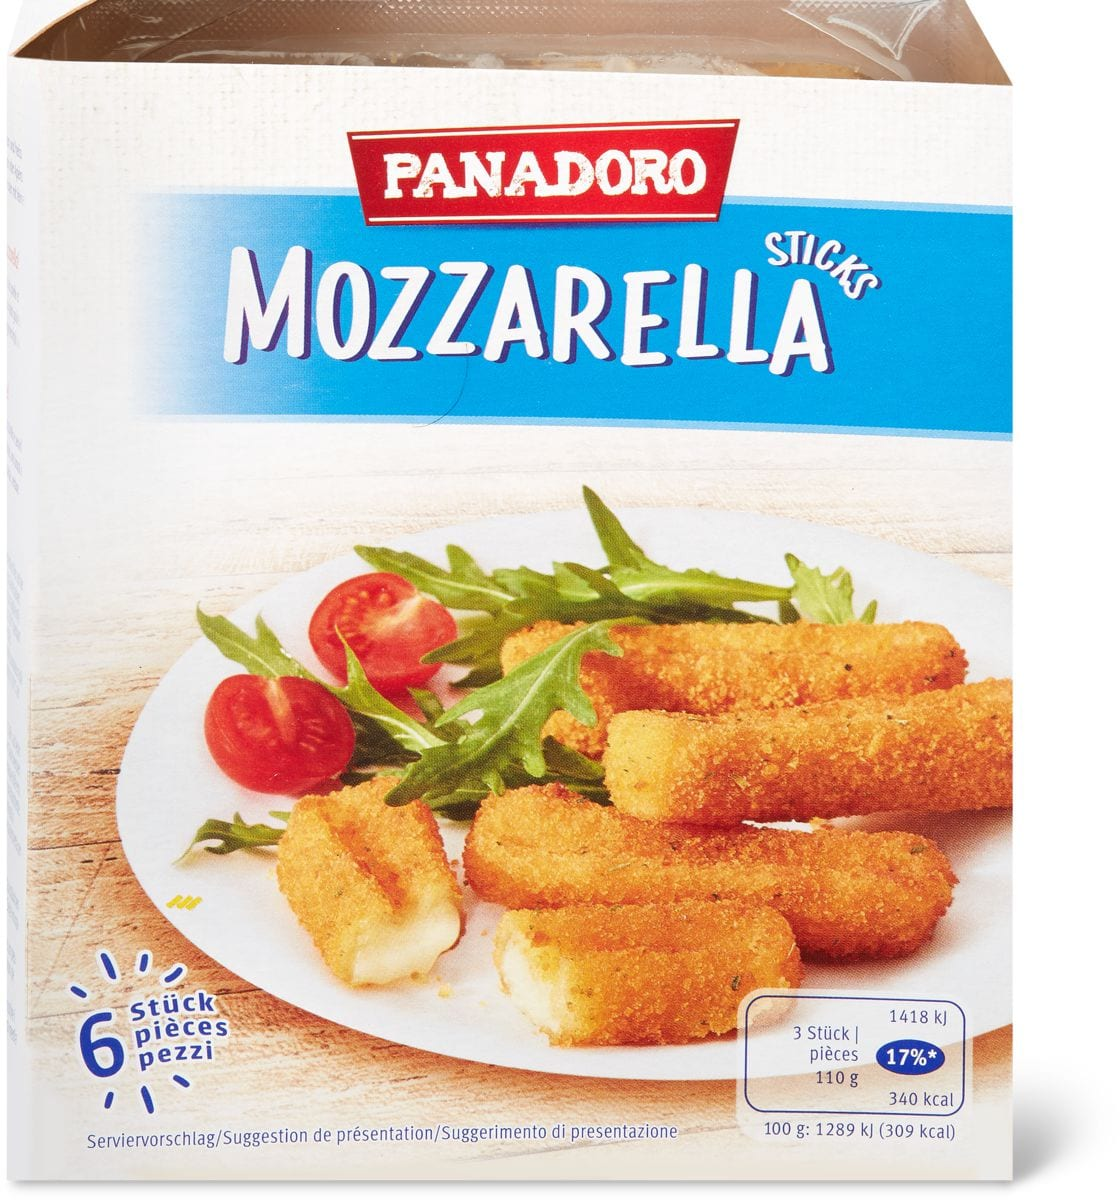 Mozzarella Panadoro sticks